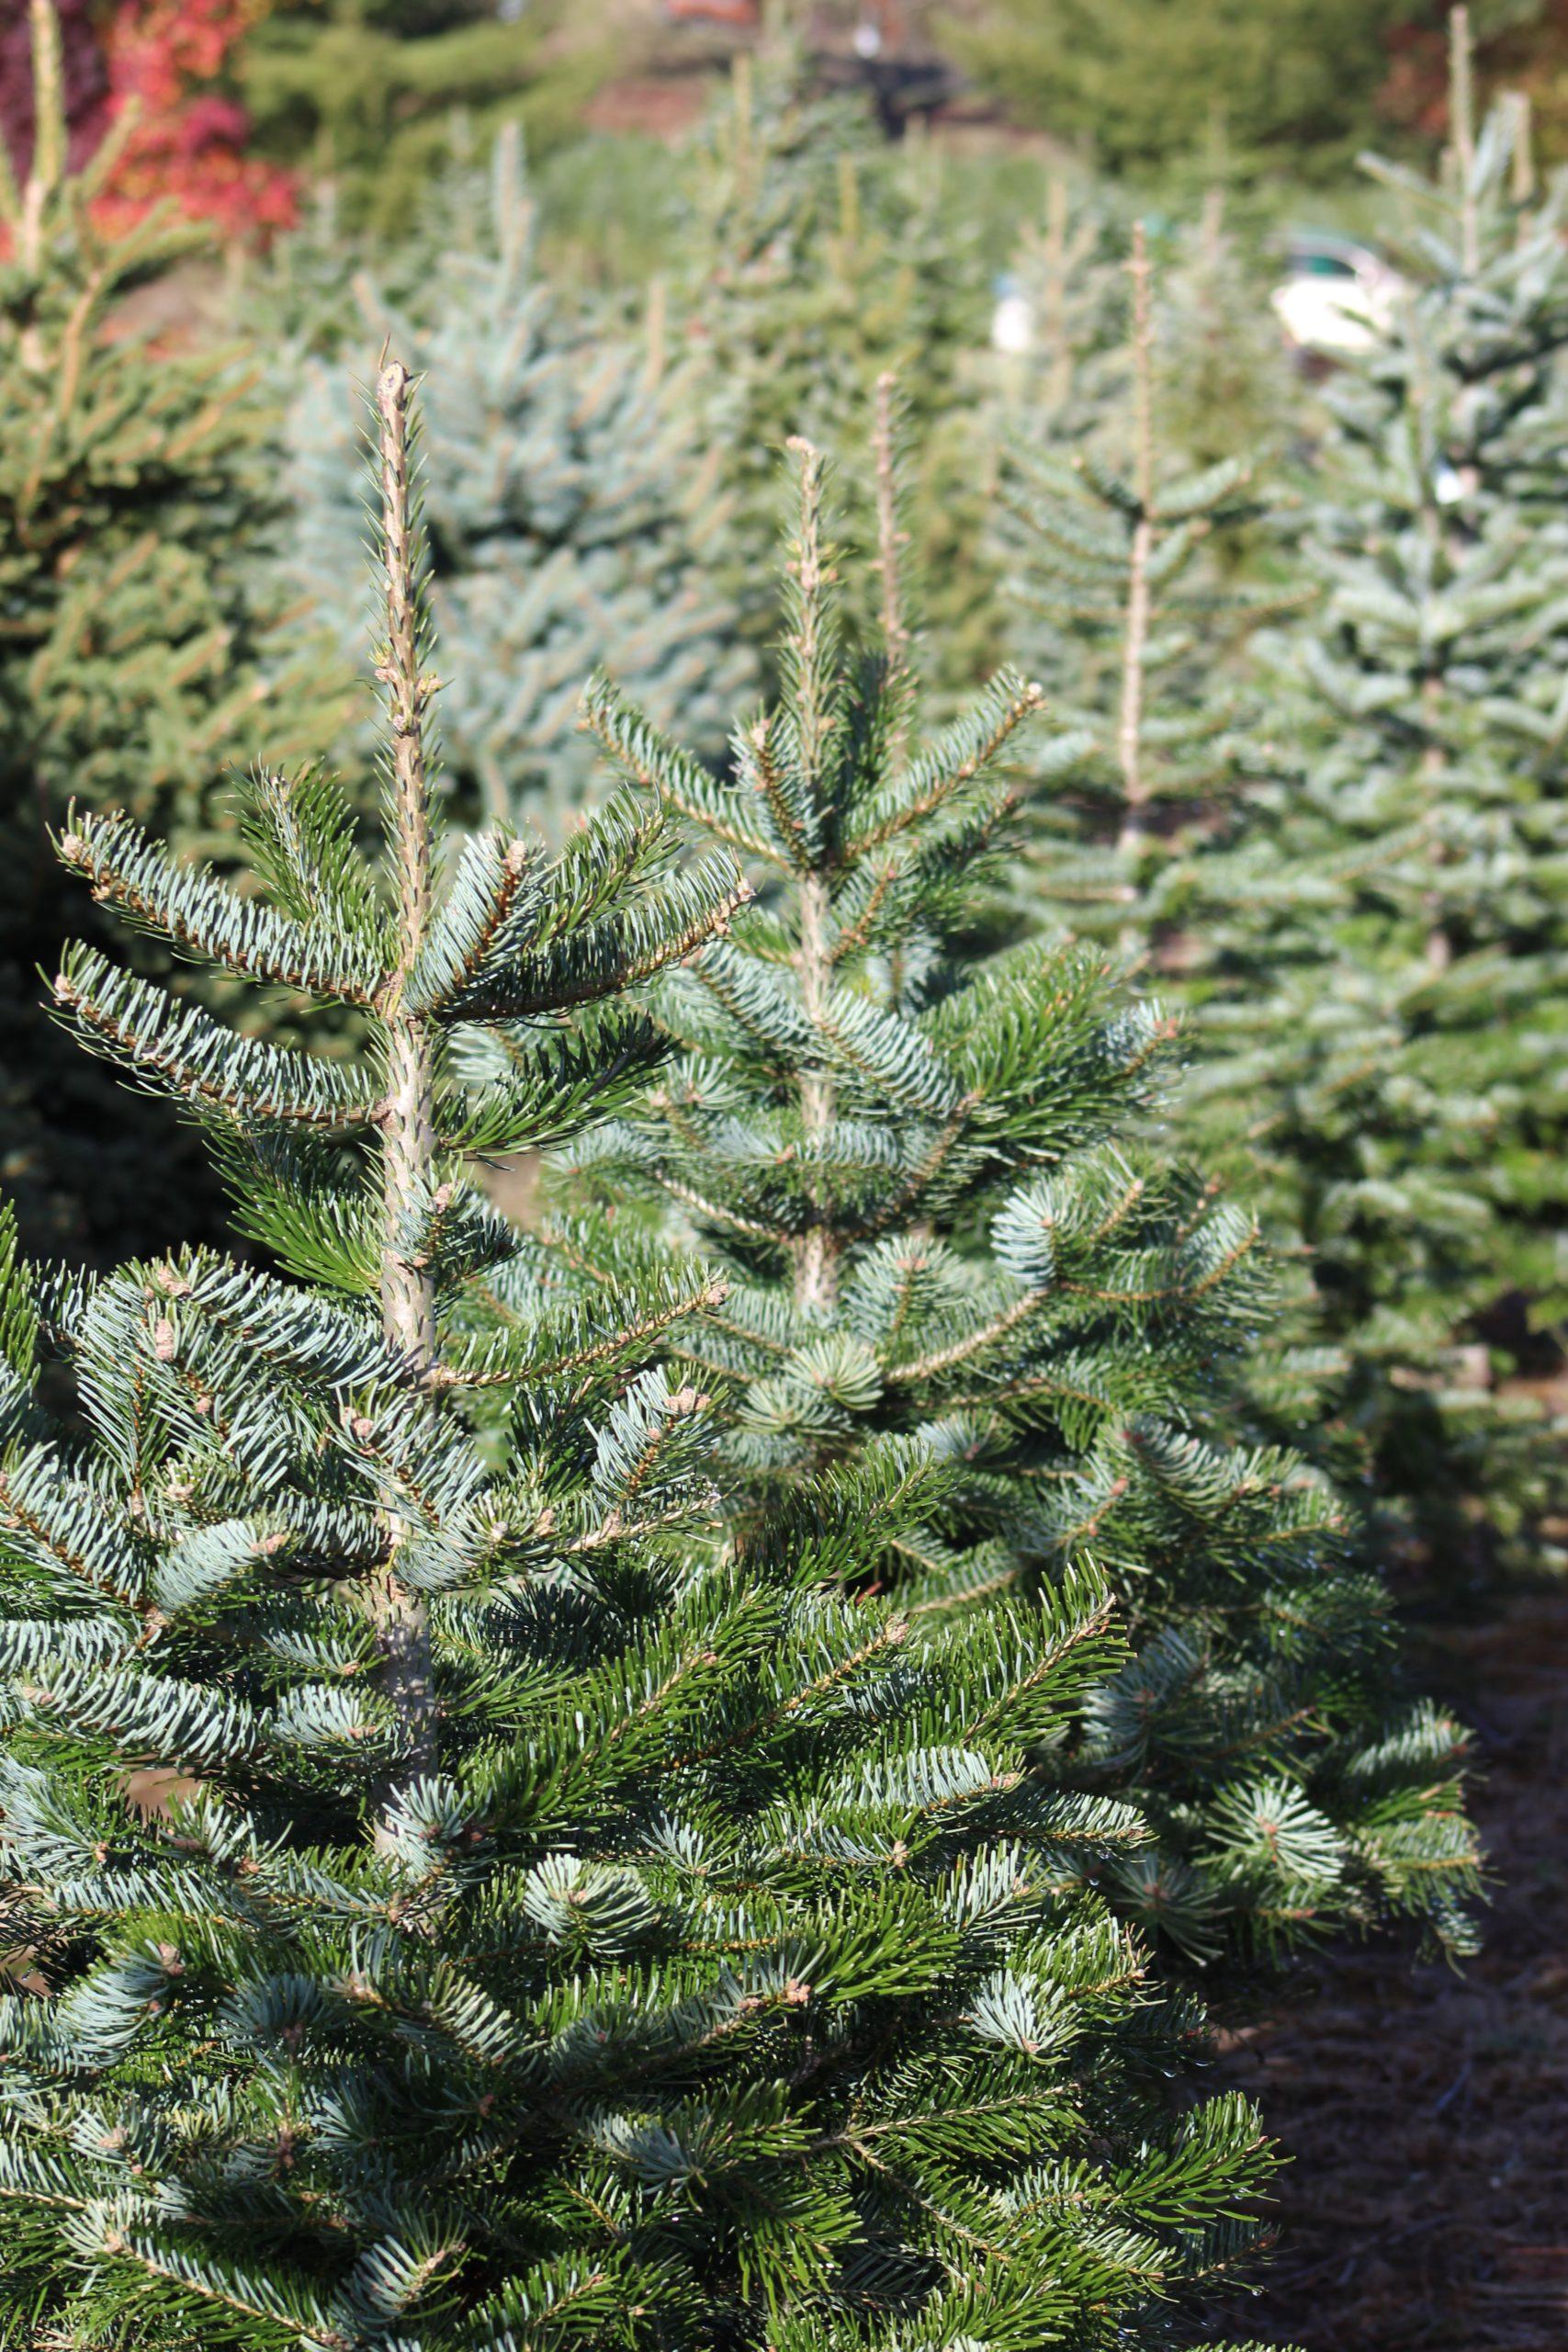 Christmas tree photo by David Boozer on Unsplash